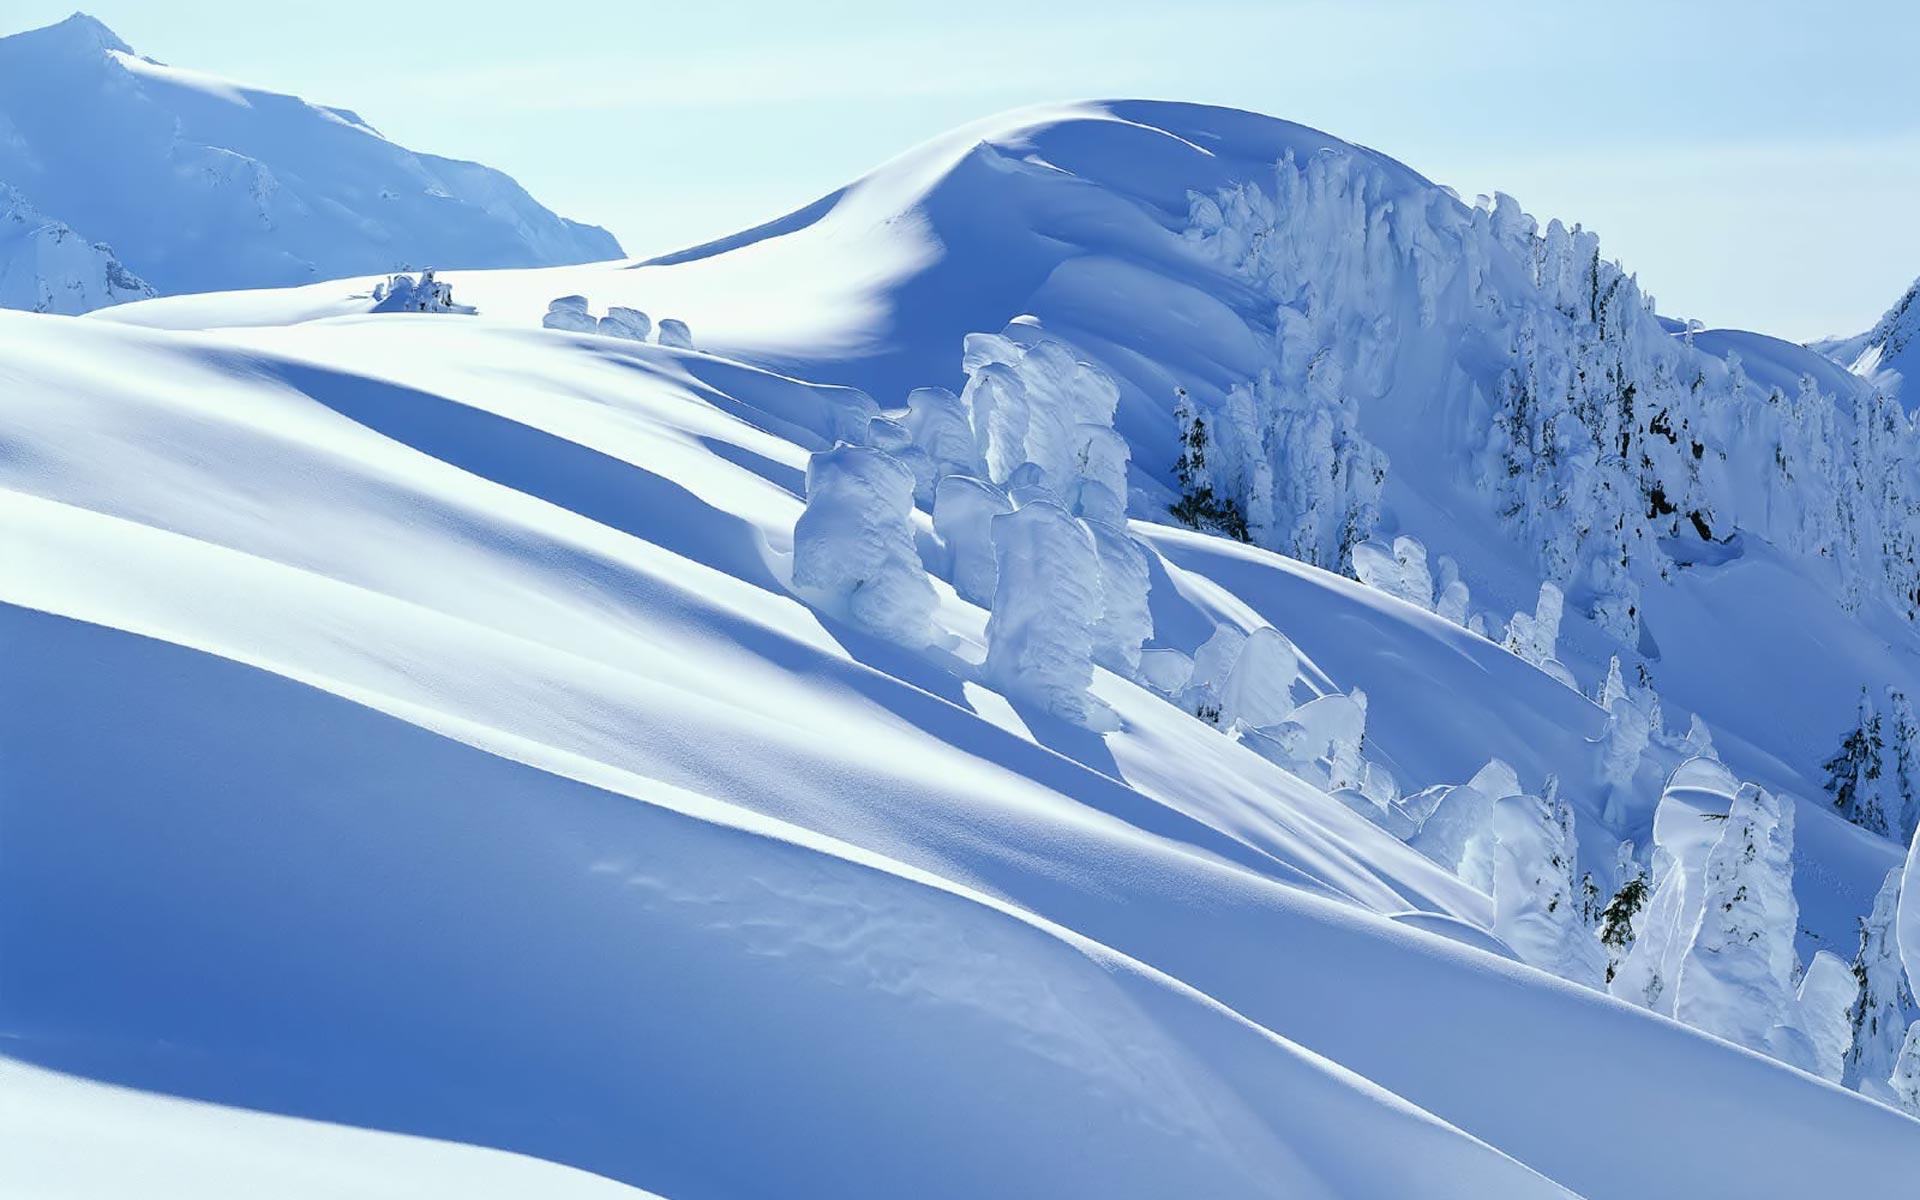 ilona wallpapers beautiful snowy - photo #20